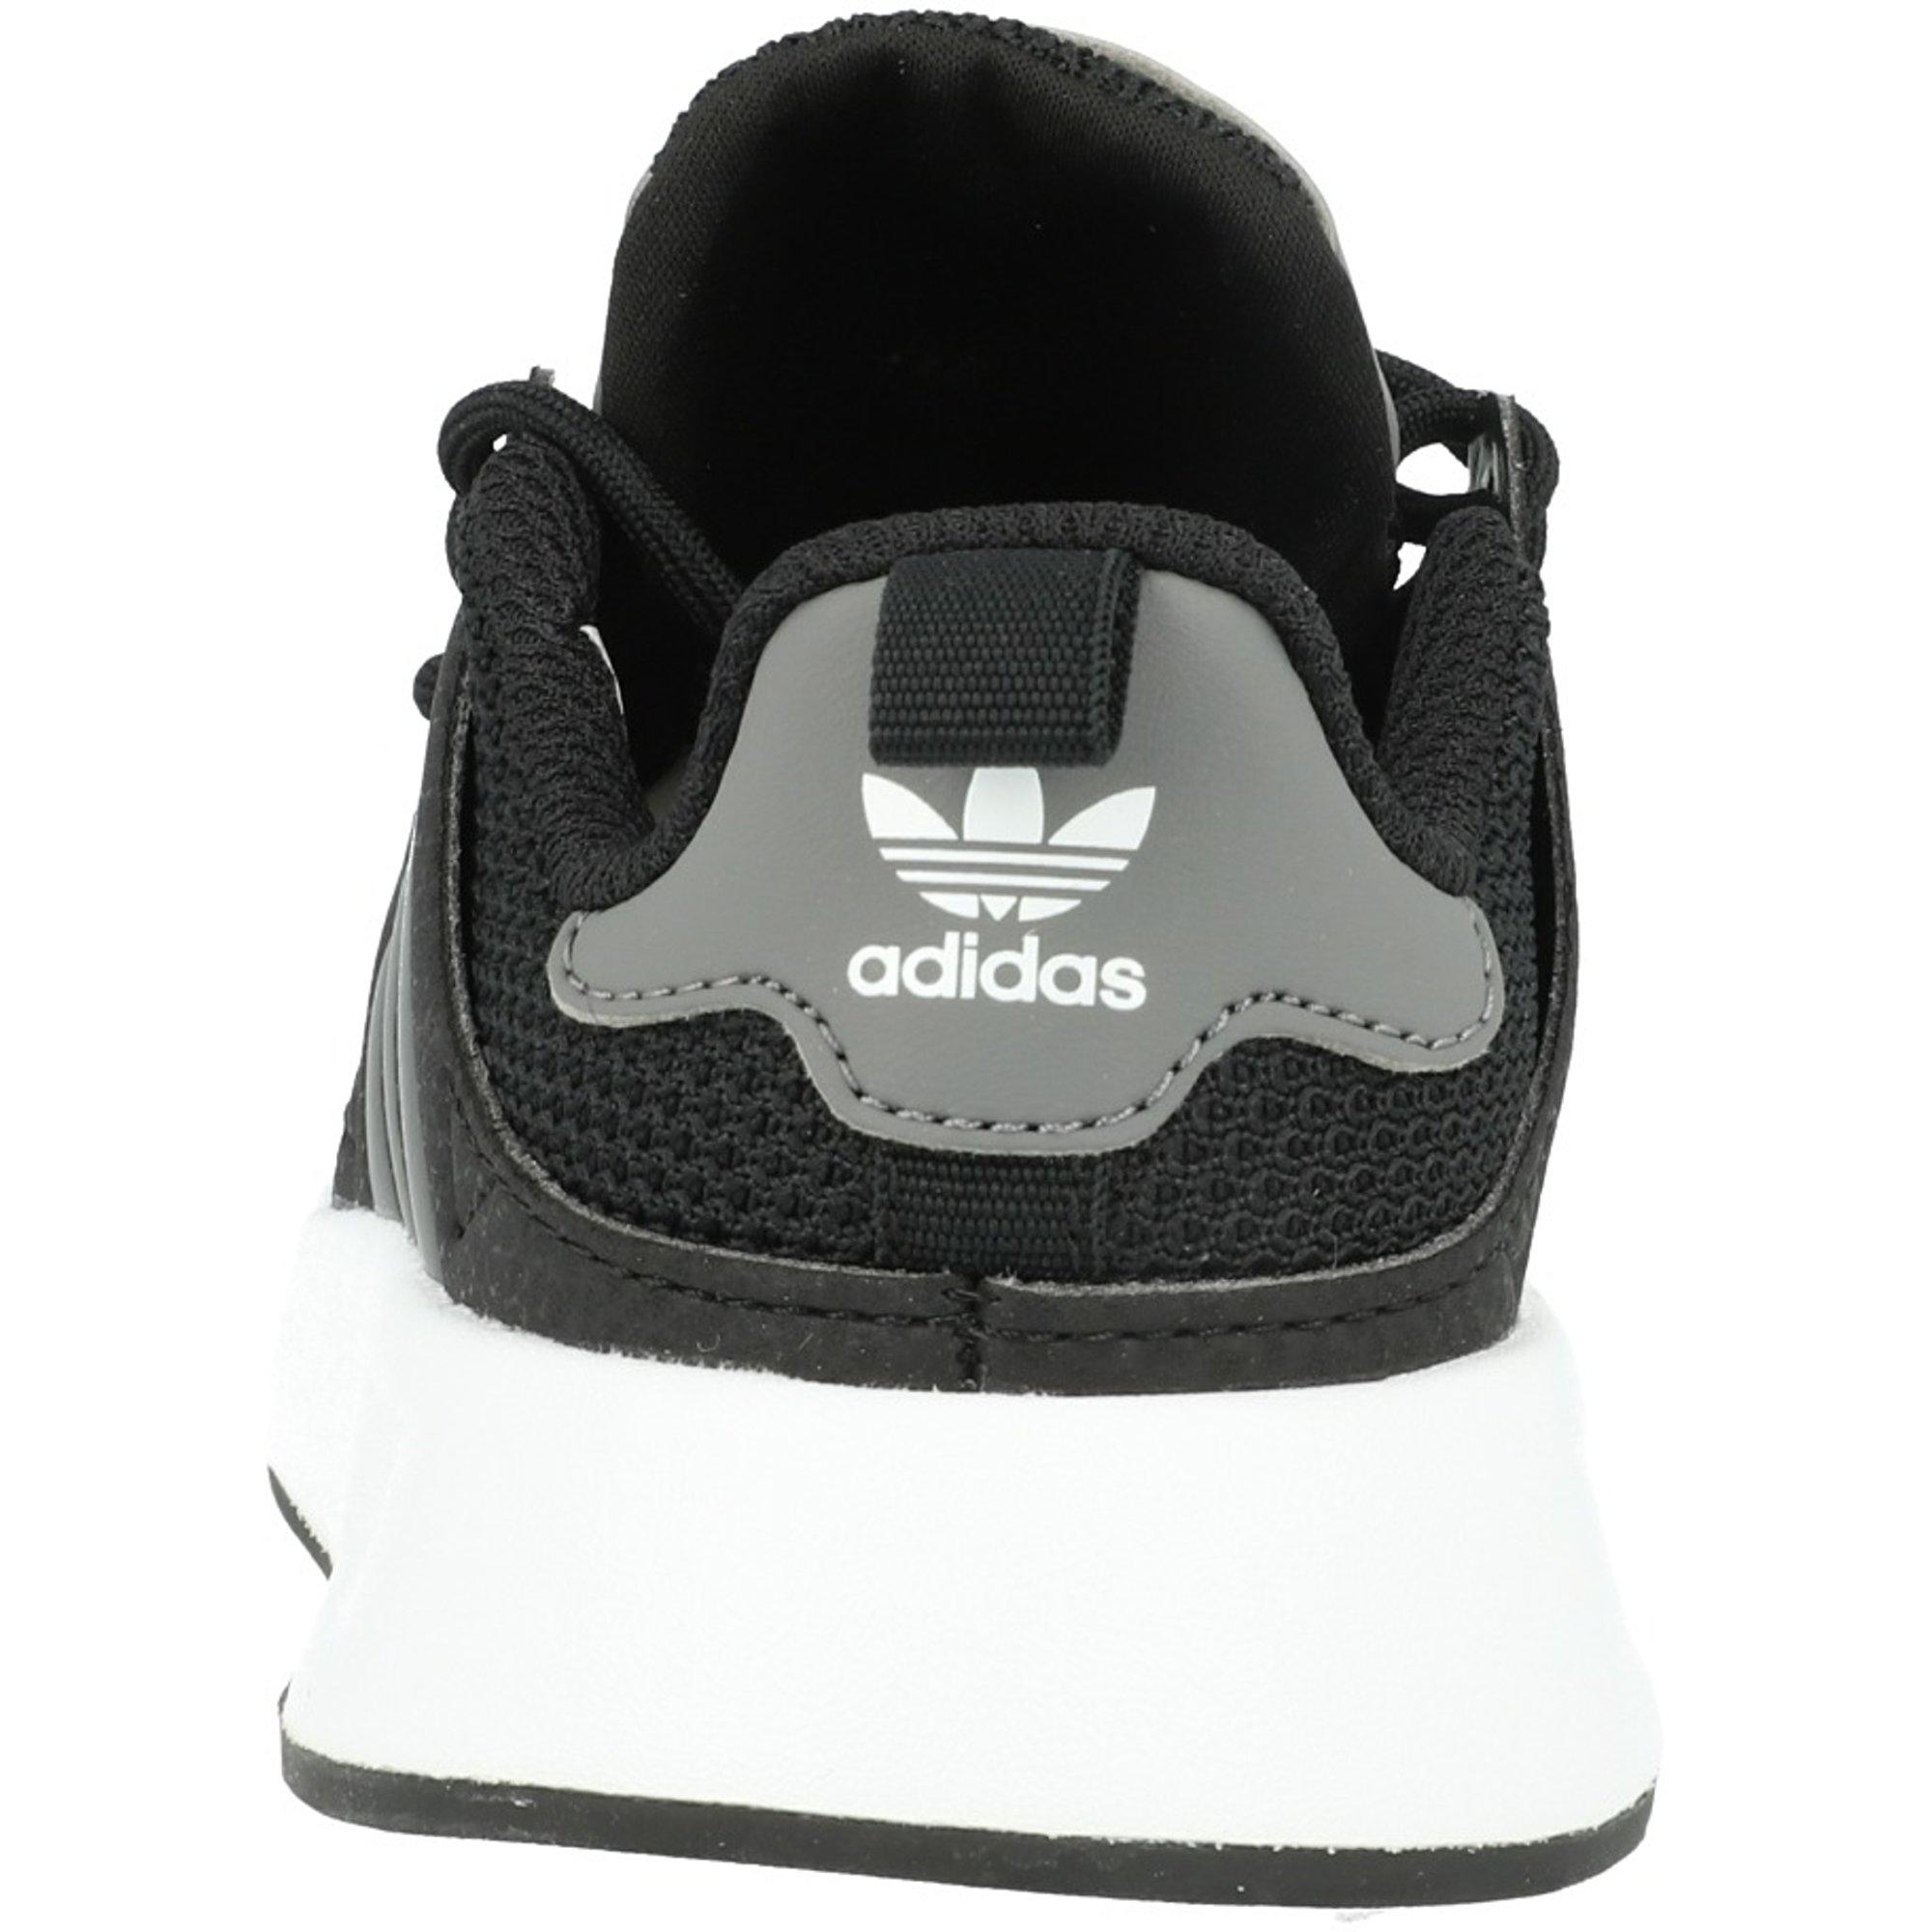 grey bermuda adidas formateurs light 5R3Lq4Aj